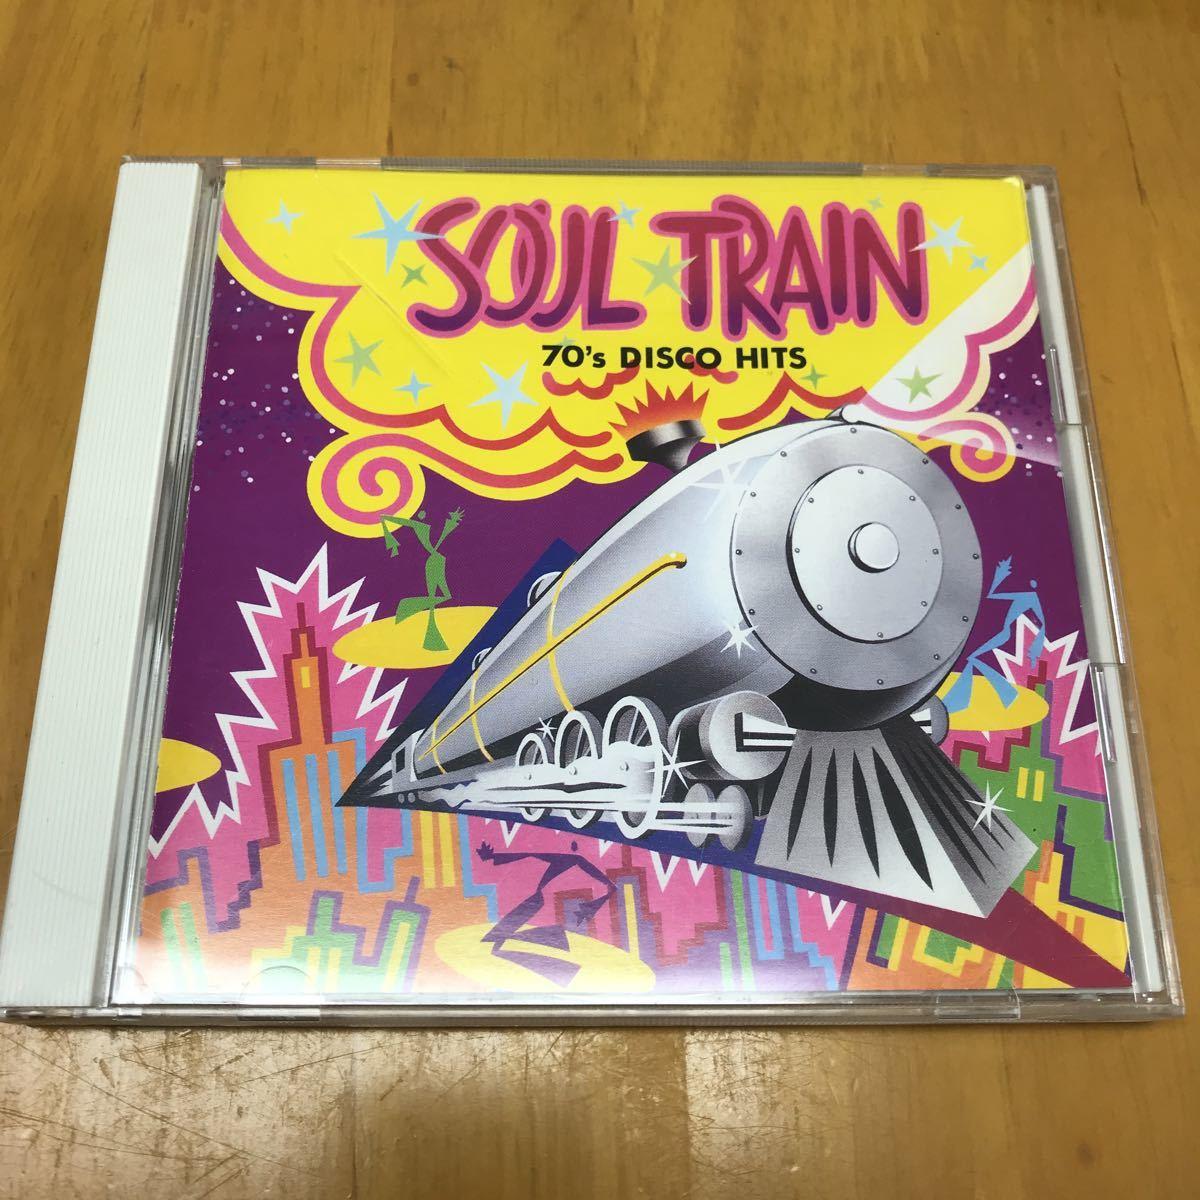 SOUL TRAIN ~70's DISCO HITS 国内盤CD ダンス ディスコ_画像1